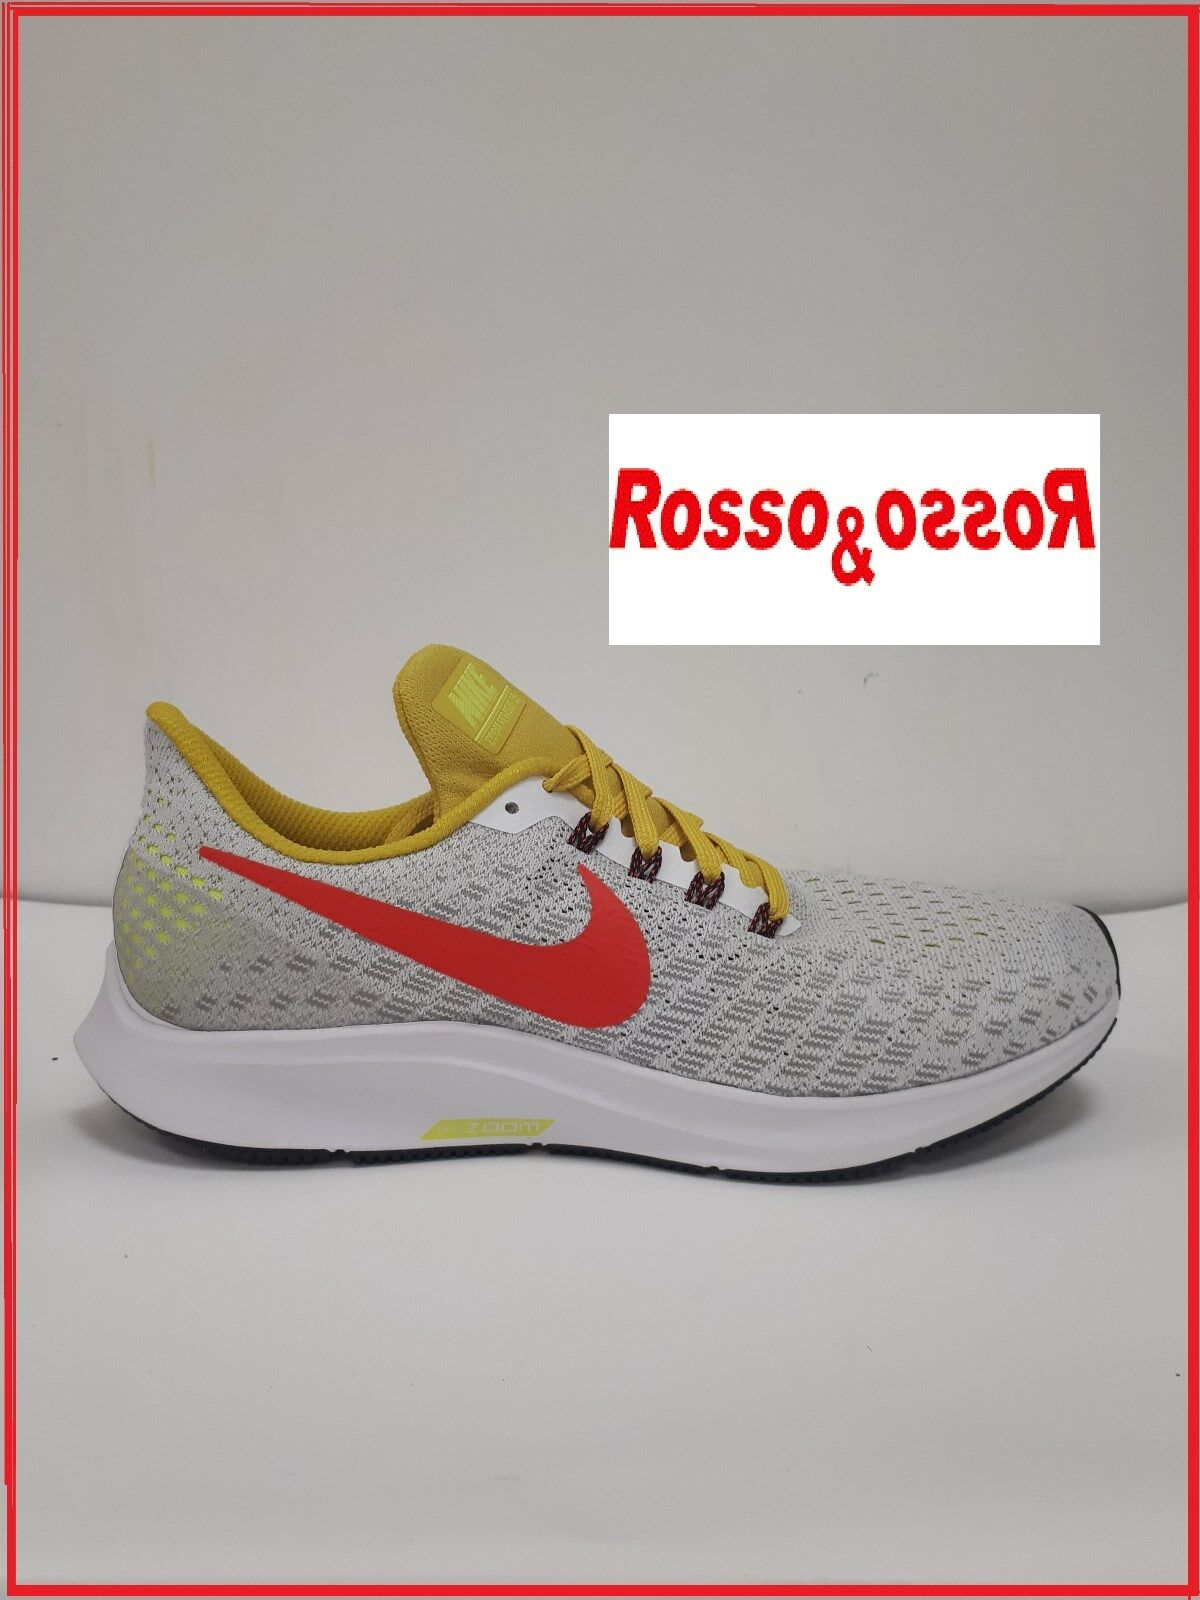 Scarpe NIKE AIR ZOOM PEGASUS 35 da Donna 39 scarpe da ginnastica Ginnastica Running Grigie